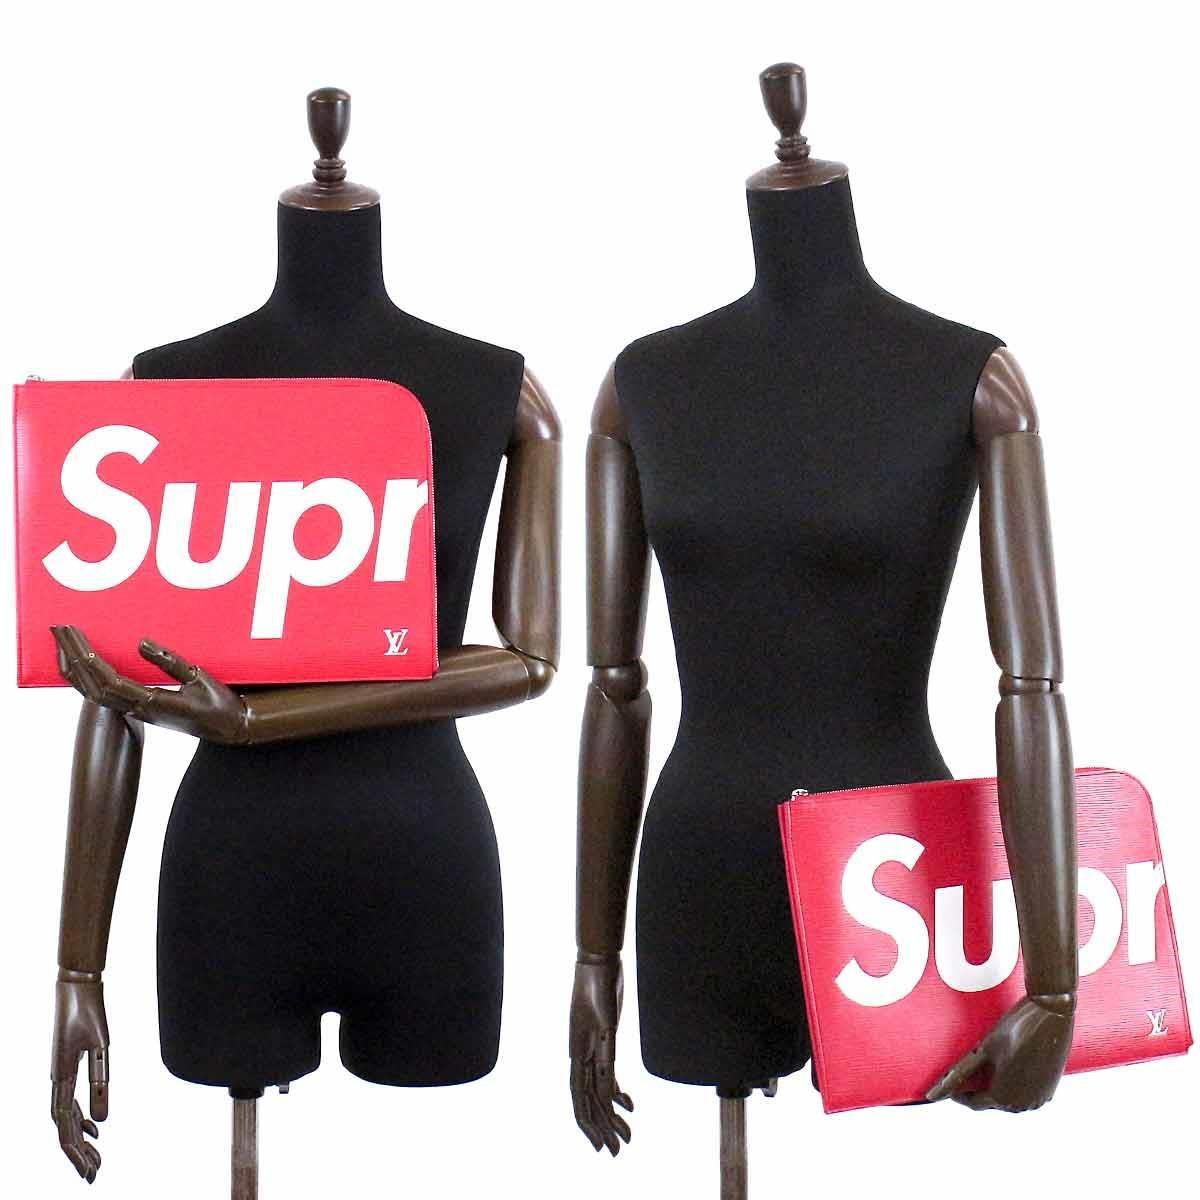 56cd695da628 Lyst - Louis Vuitton Supreme Pochette Jour Gm Clutch Bag Red M67722 ...